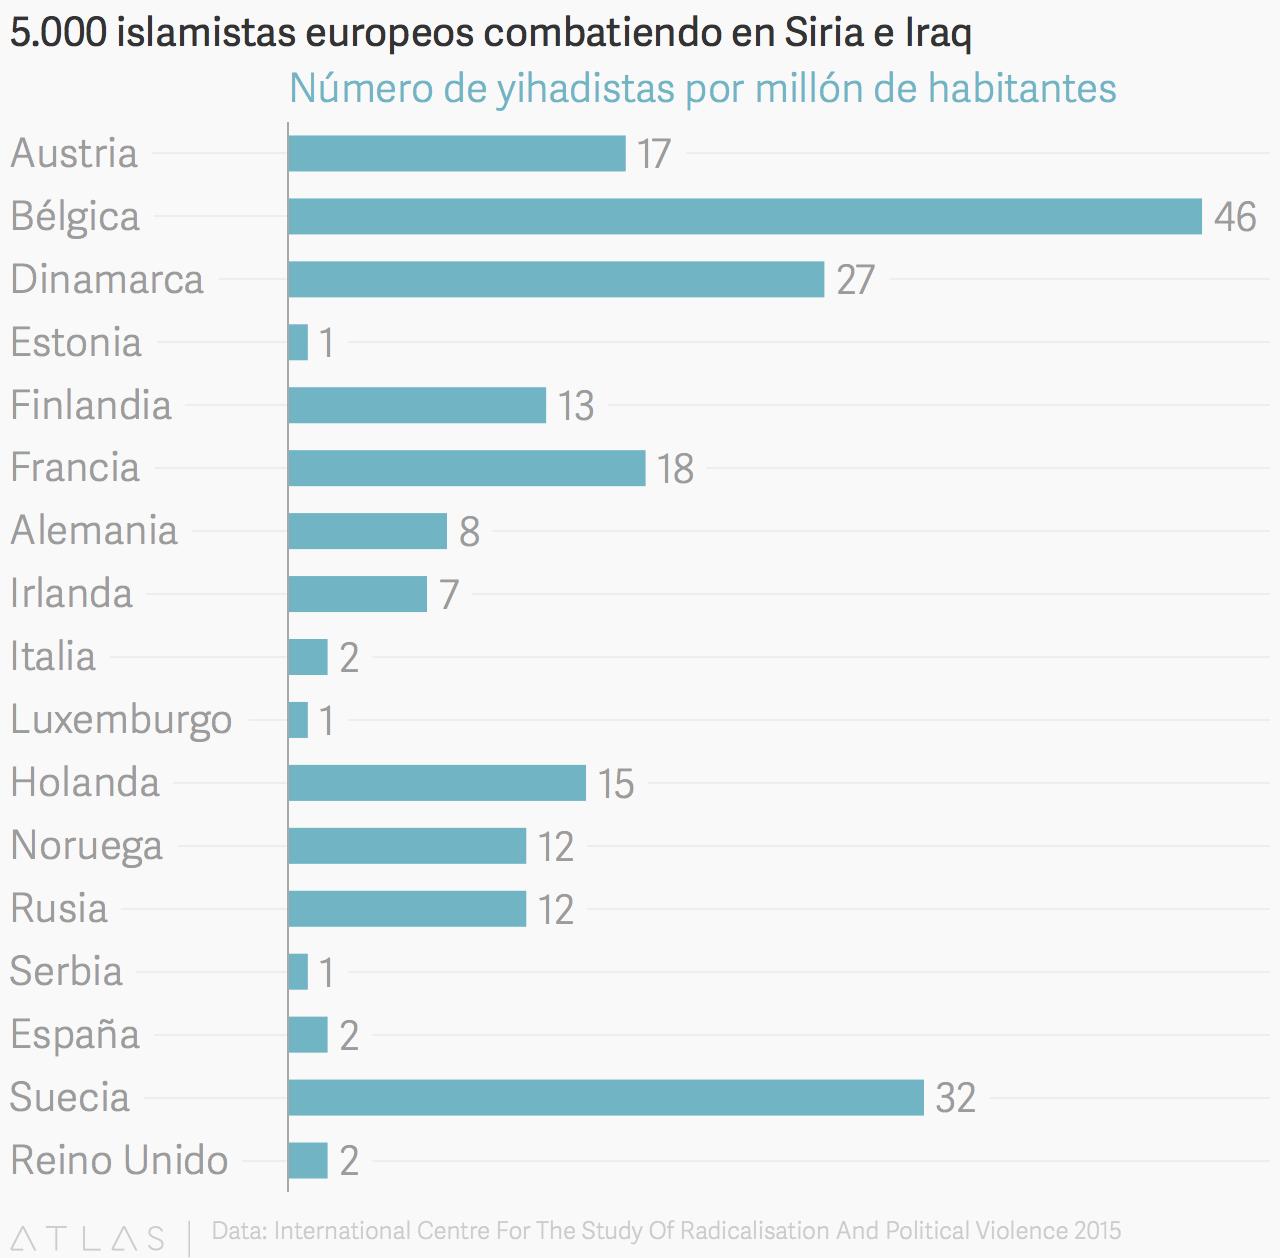 YihadistasEuropeos-ICSR.png